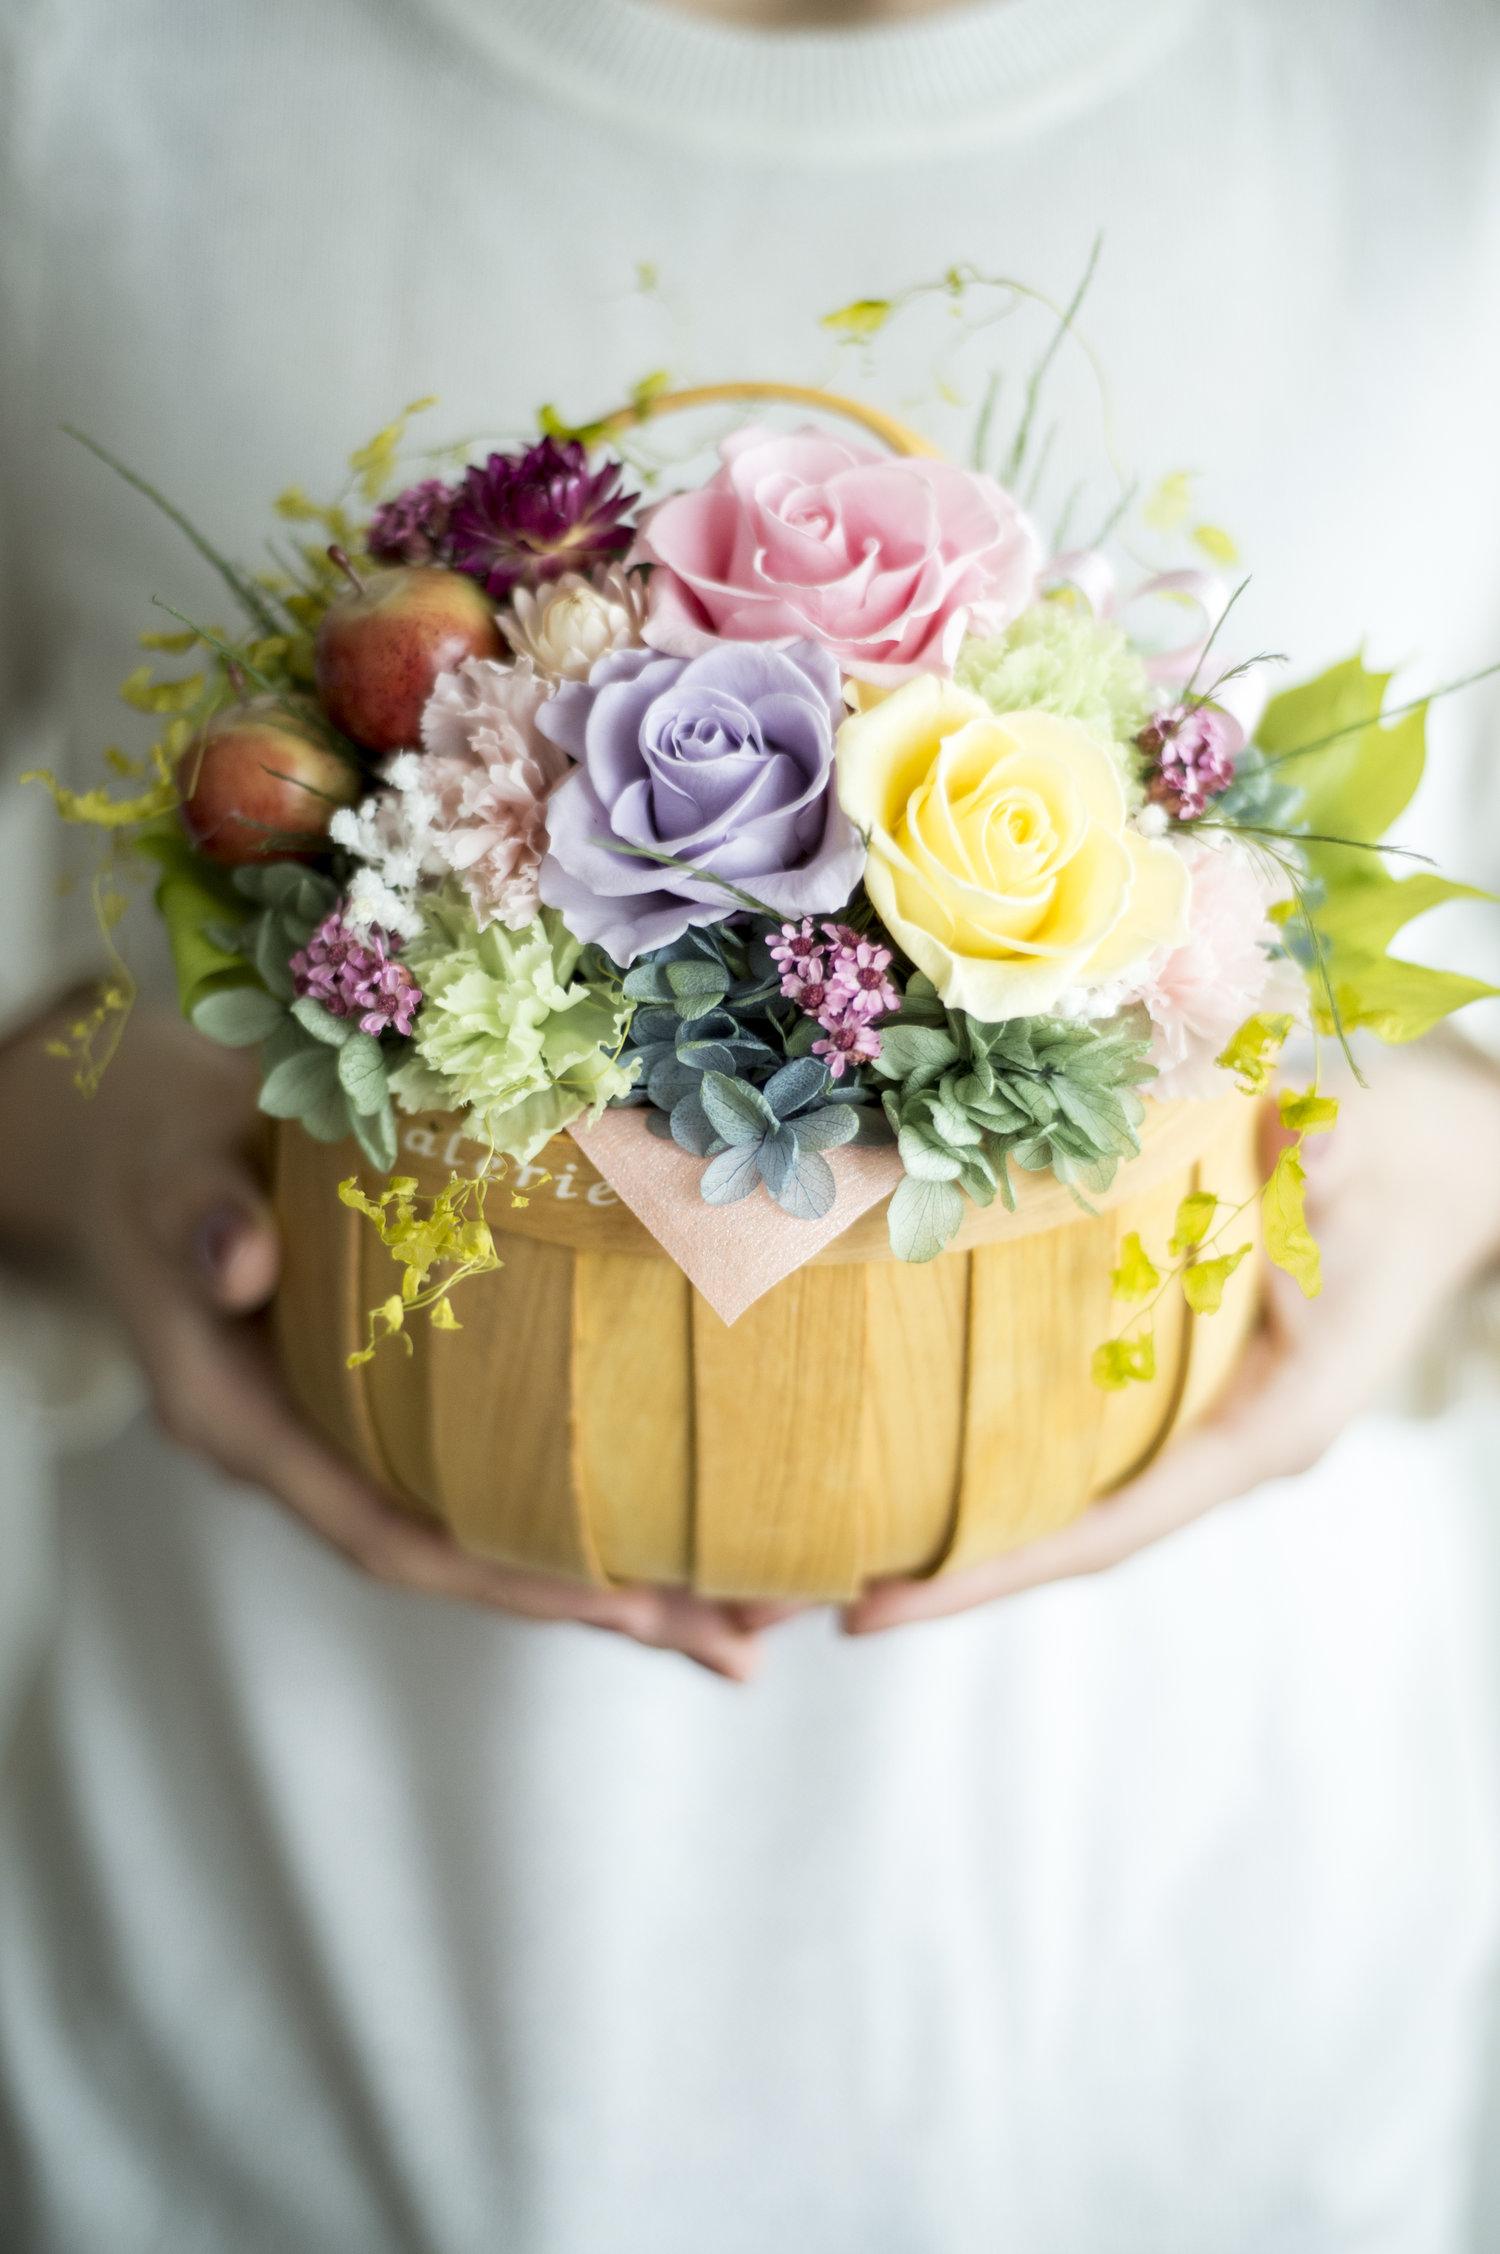 Eardley spring gift of preserved flower arrangement mothers day 2018g izmirmasajfo